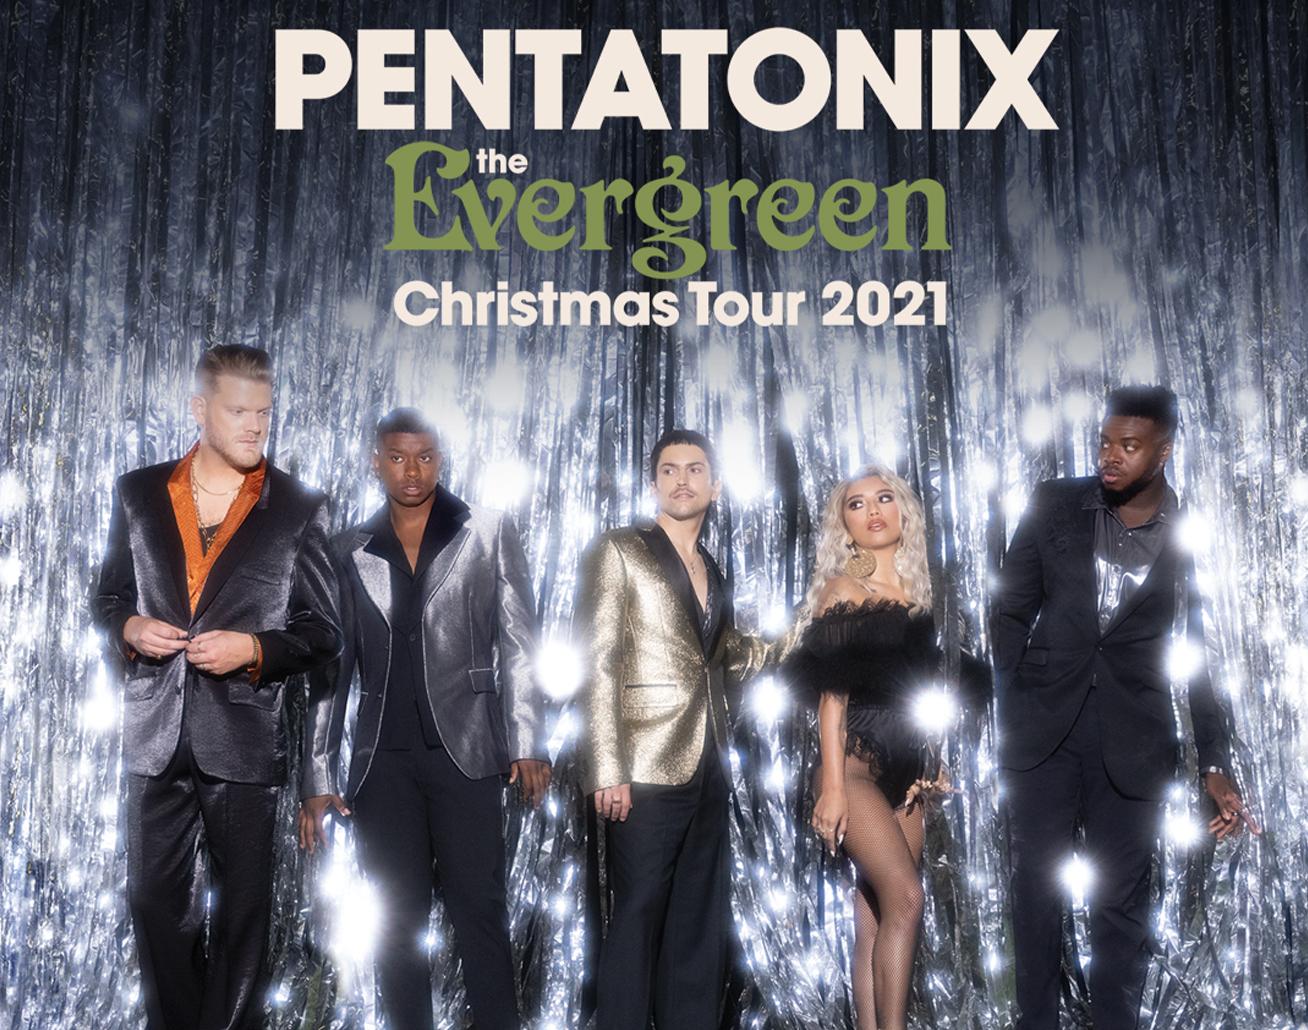 Pentatonix at Giant Center on December 9th